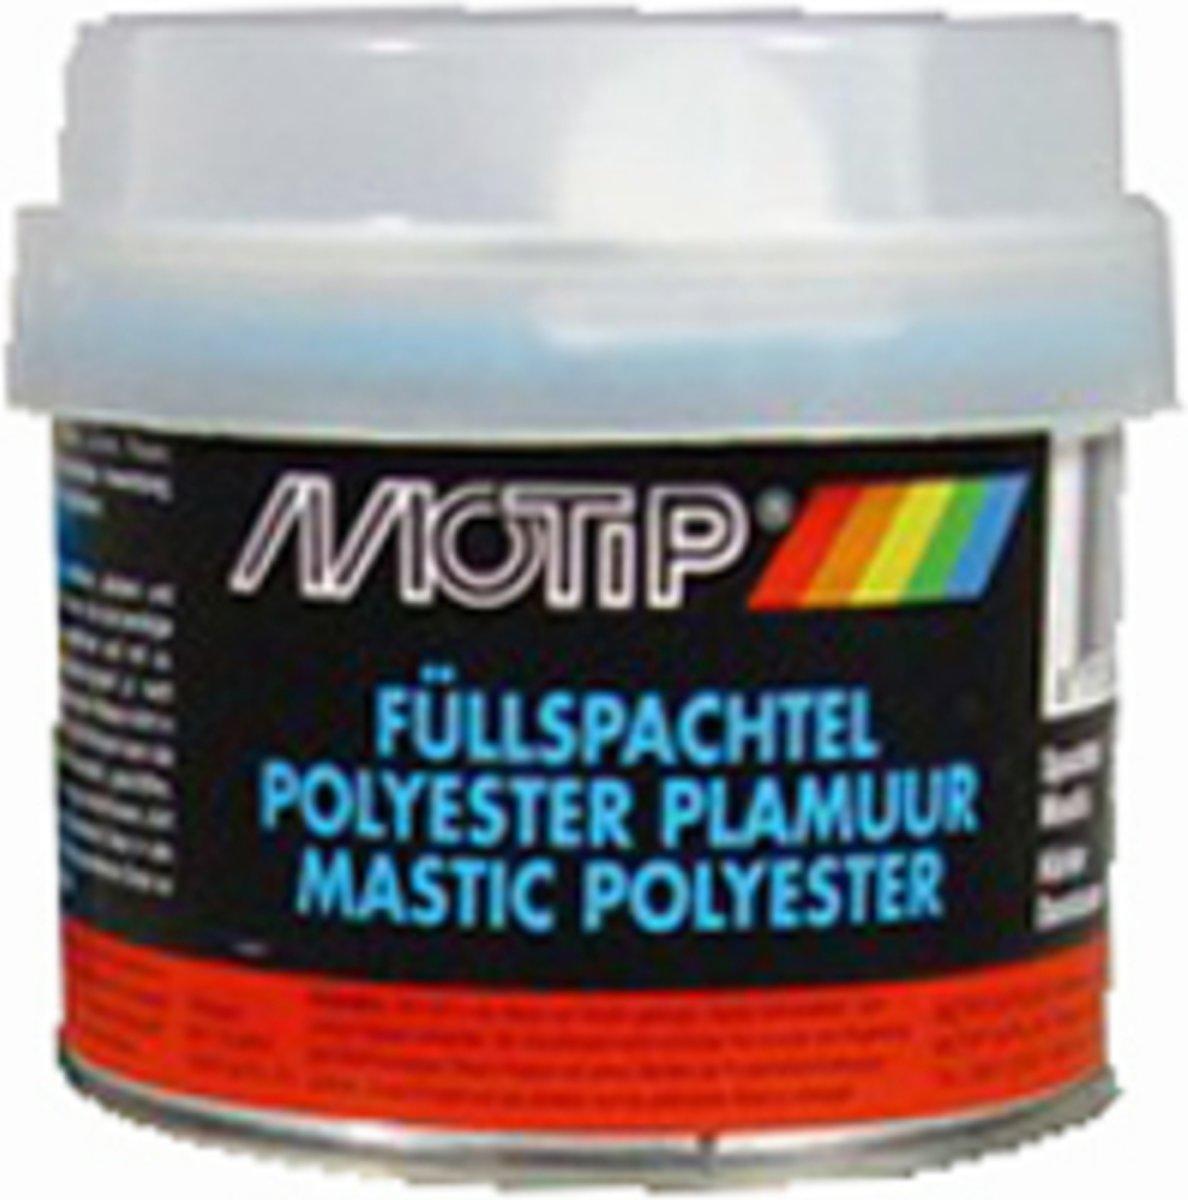 Motip Polyesterplamuur - 1 kg